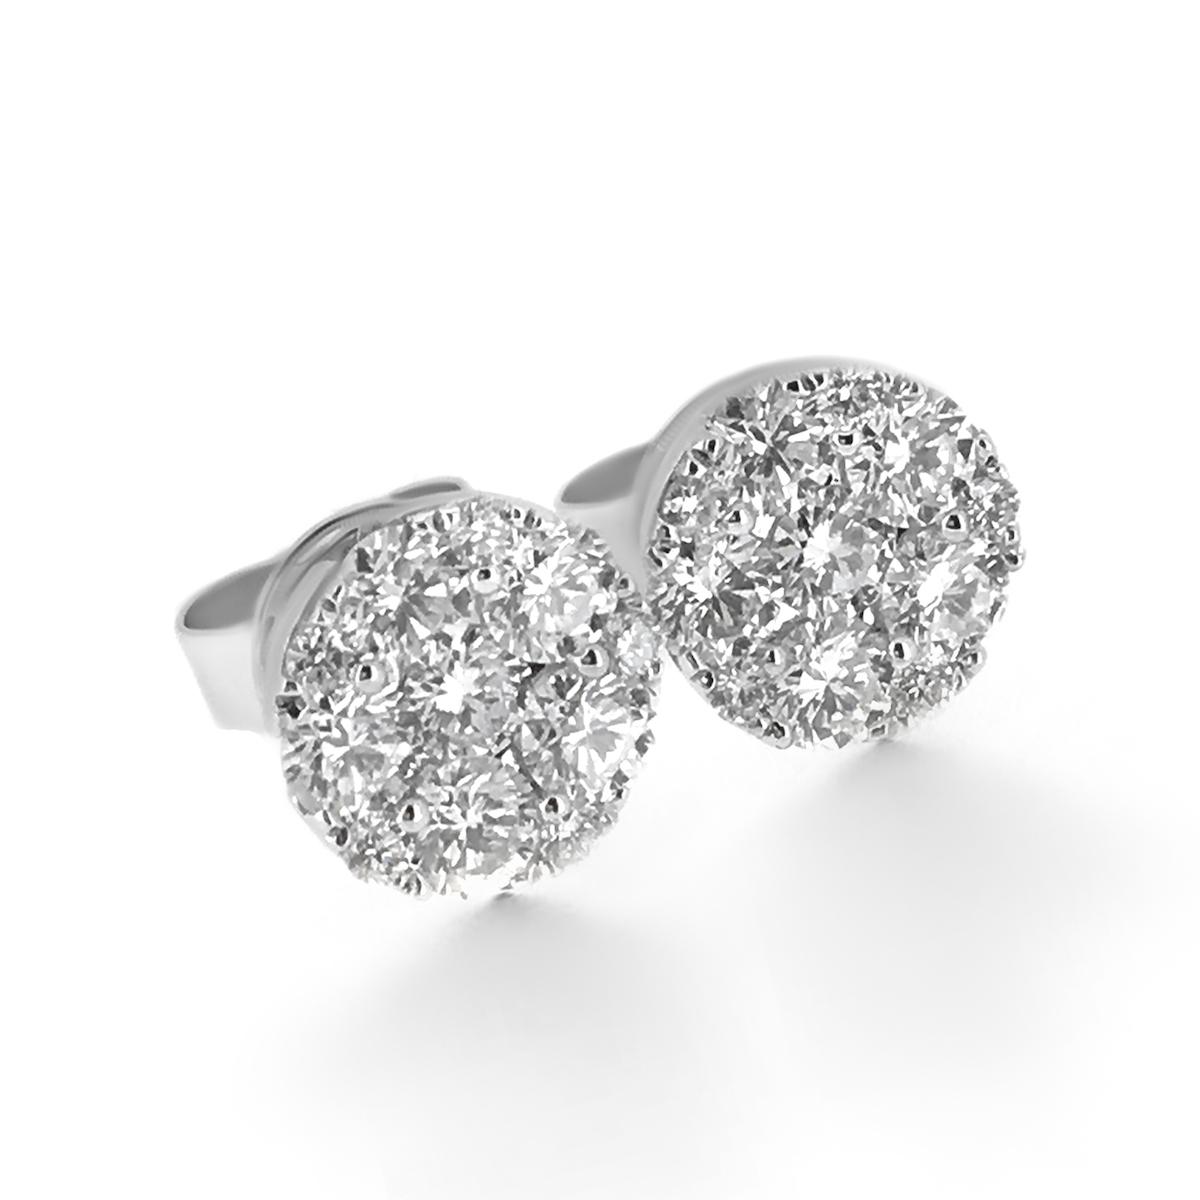 Illusion Set Diamond Earrings  Haywards Of Hong Kong. French Bracelet. Solid Gold Bracelet. Pear Wedding Rings. Troll Beads. Popular Mens Wedding Rings. Mystic Topaz Engagement Rings. Tide Watches. Emerald Cut Diamond Anniversary Band